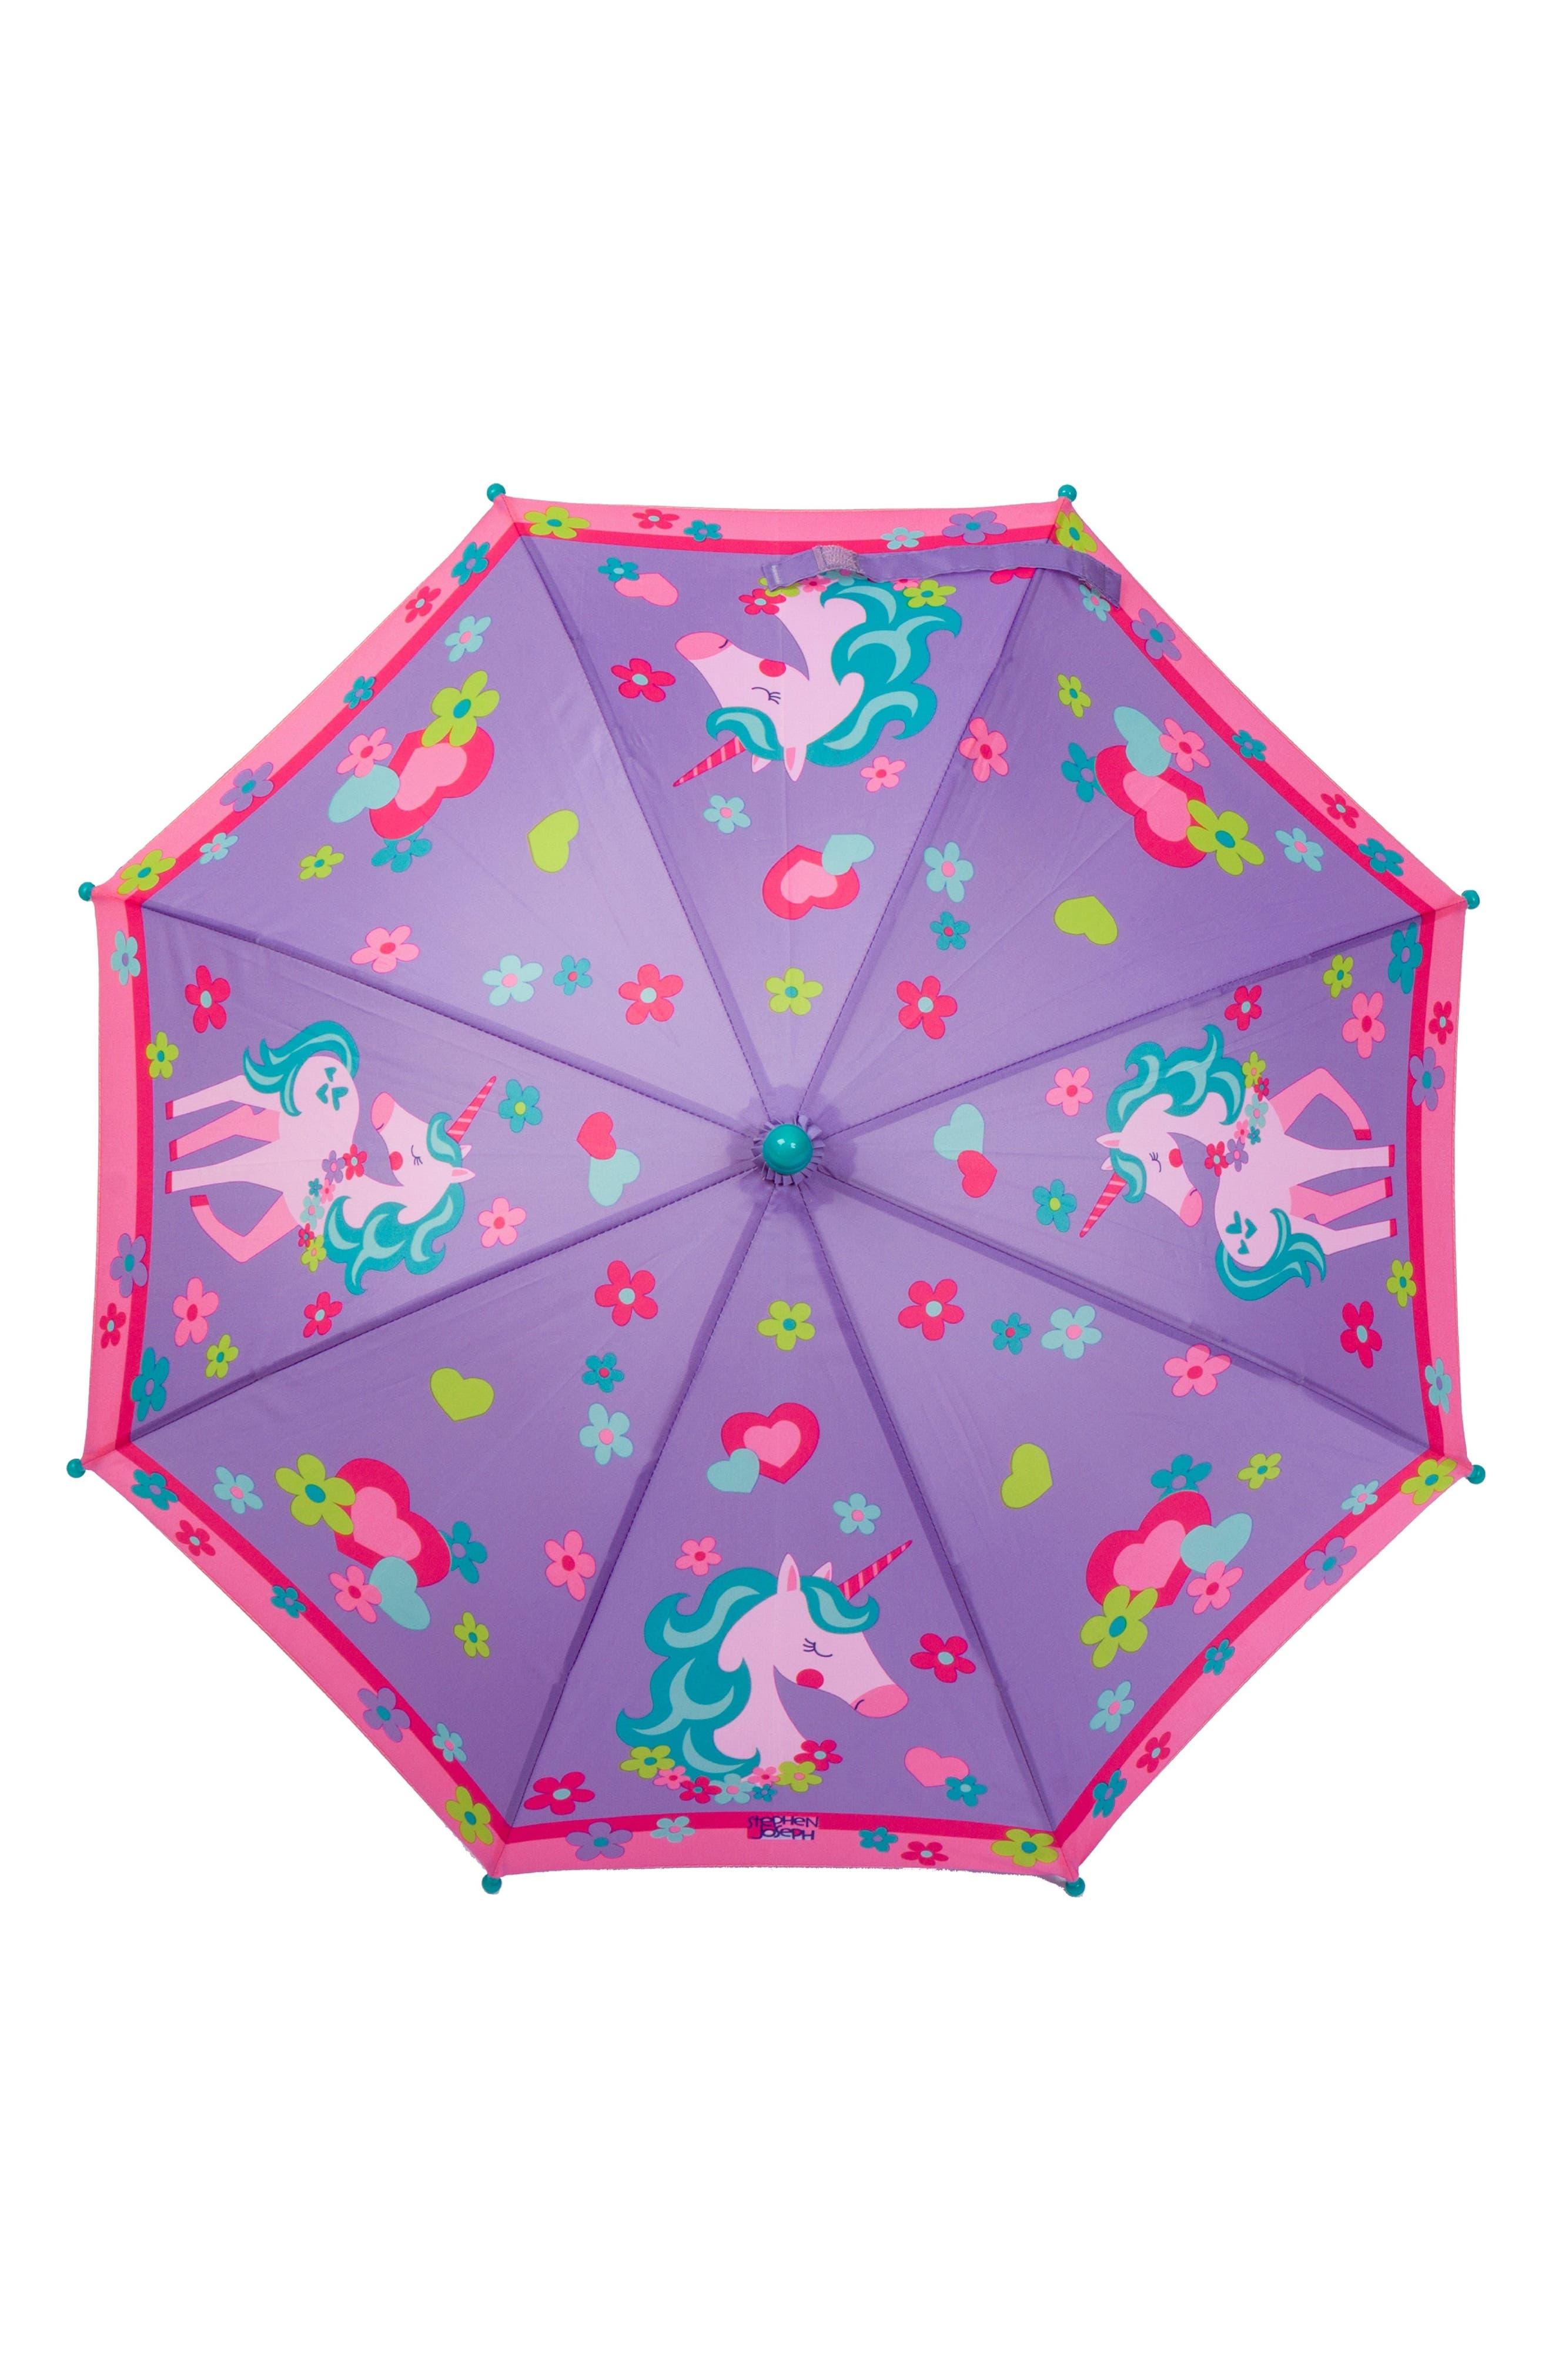 Unicorn Raincoat & Umbrella Set,                             Alternate thumbnail 2, color,                             UNICORN